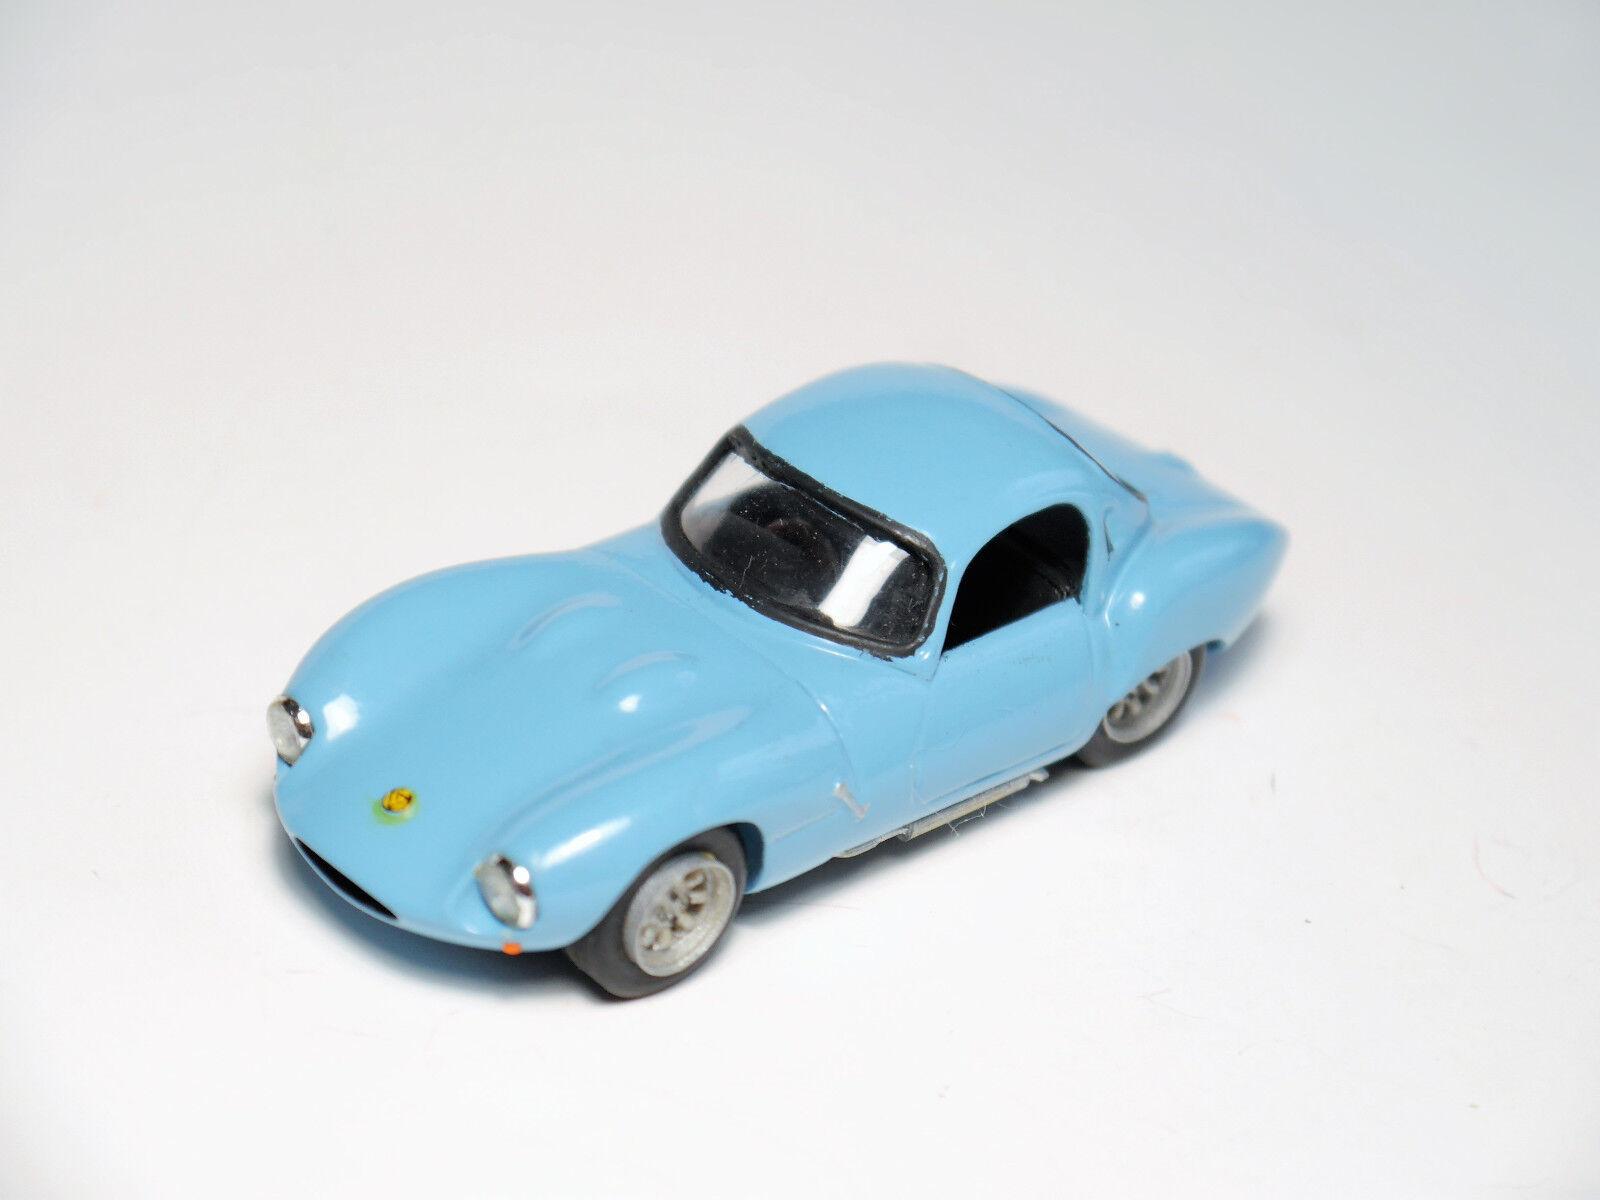 Ginetta g4 COUPE in blu blu, fatto a mano handmade/East Anglia models in 1:43